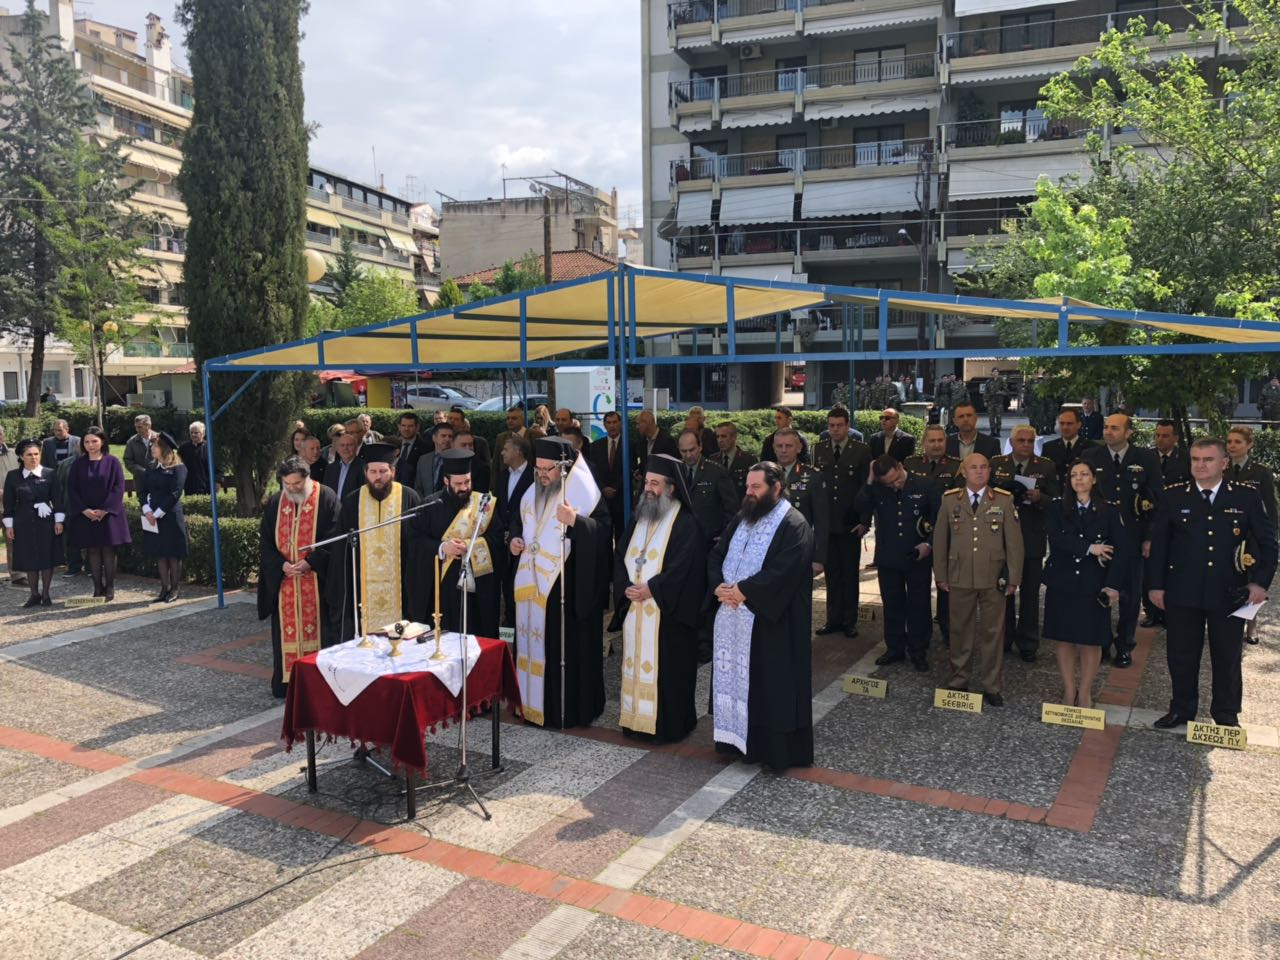 trisagio ygeionomikou 5 - Εκκλησιαστικά Νέα και Ειδήσεις